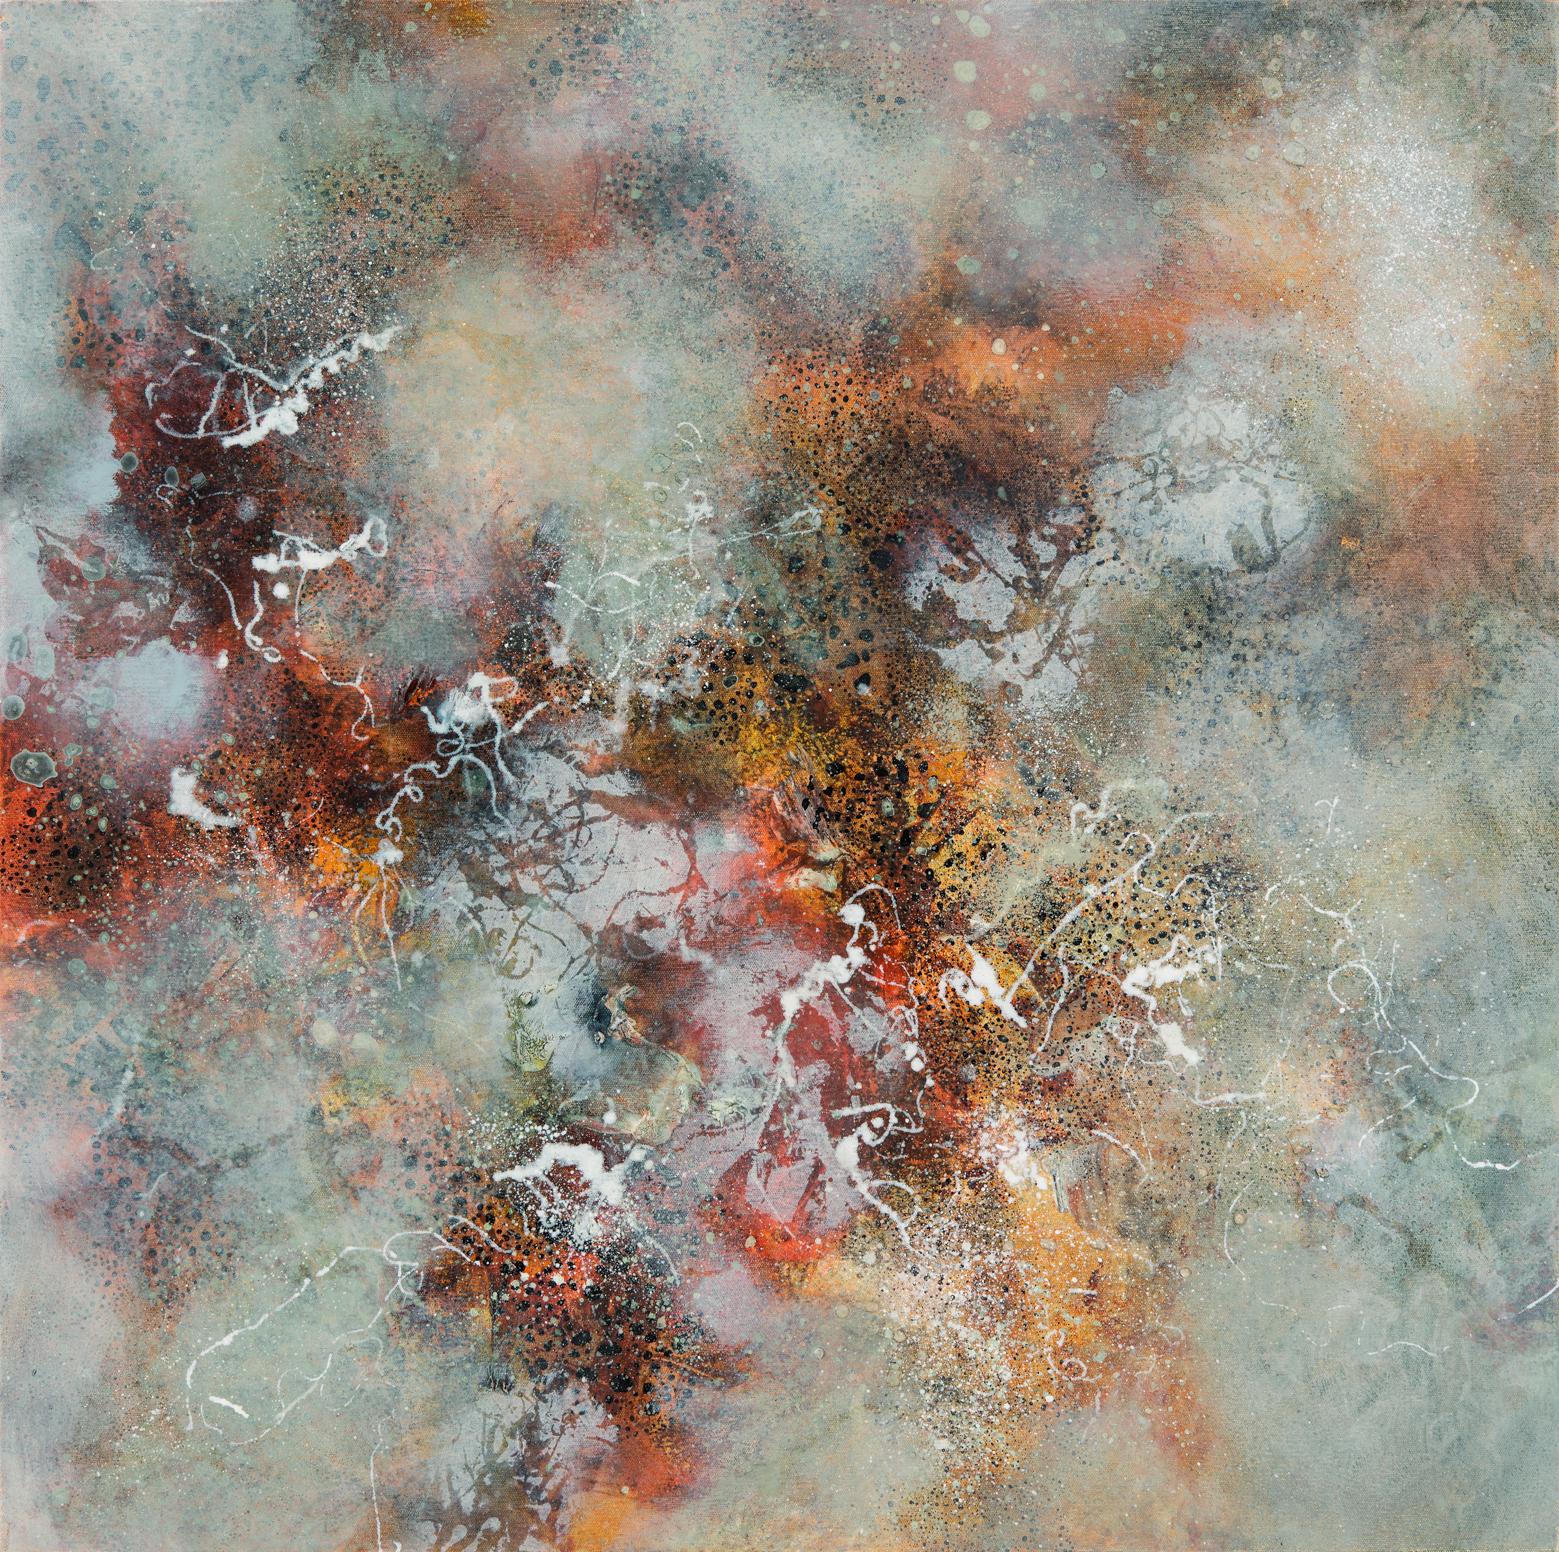 Essence, oil on canvas, 76 x 76 cm